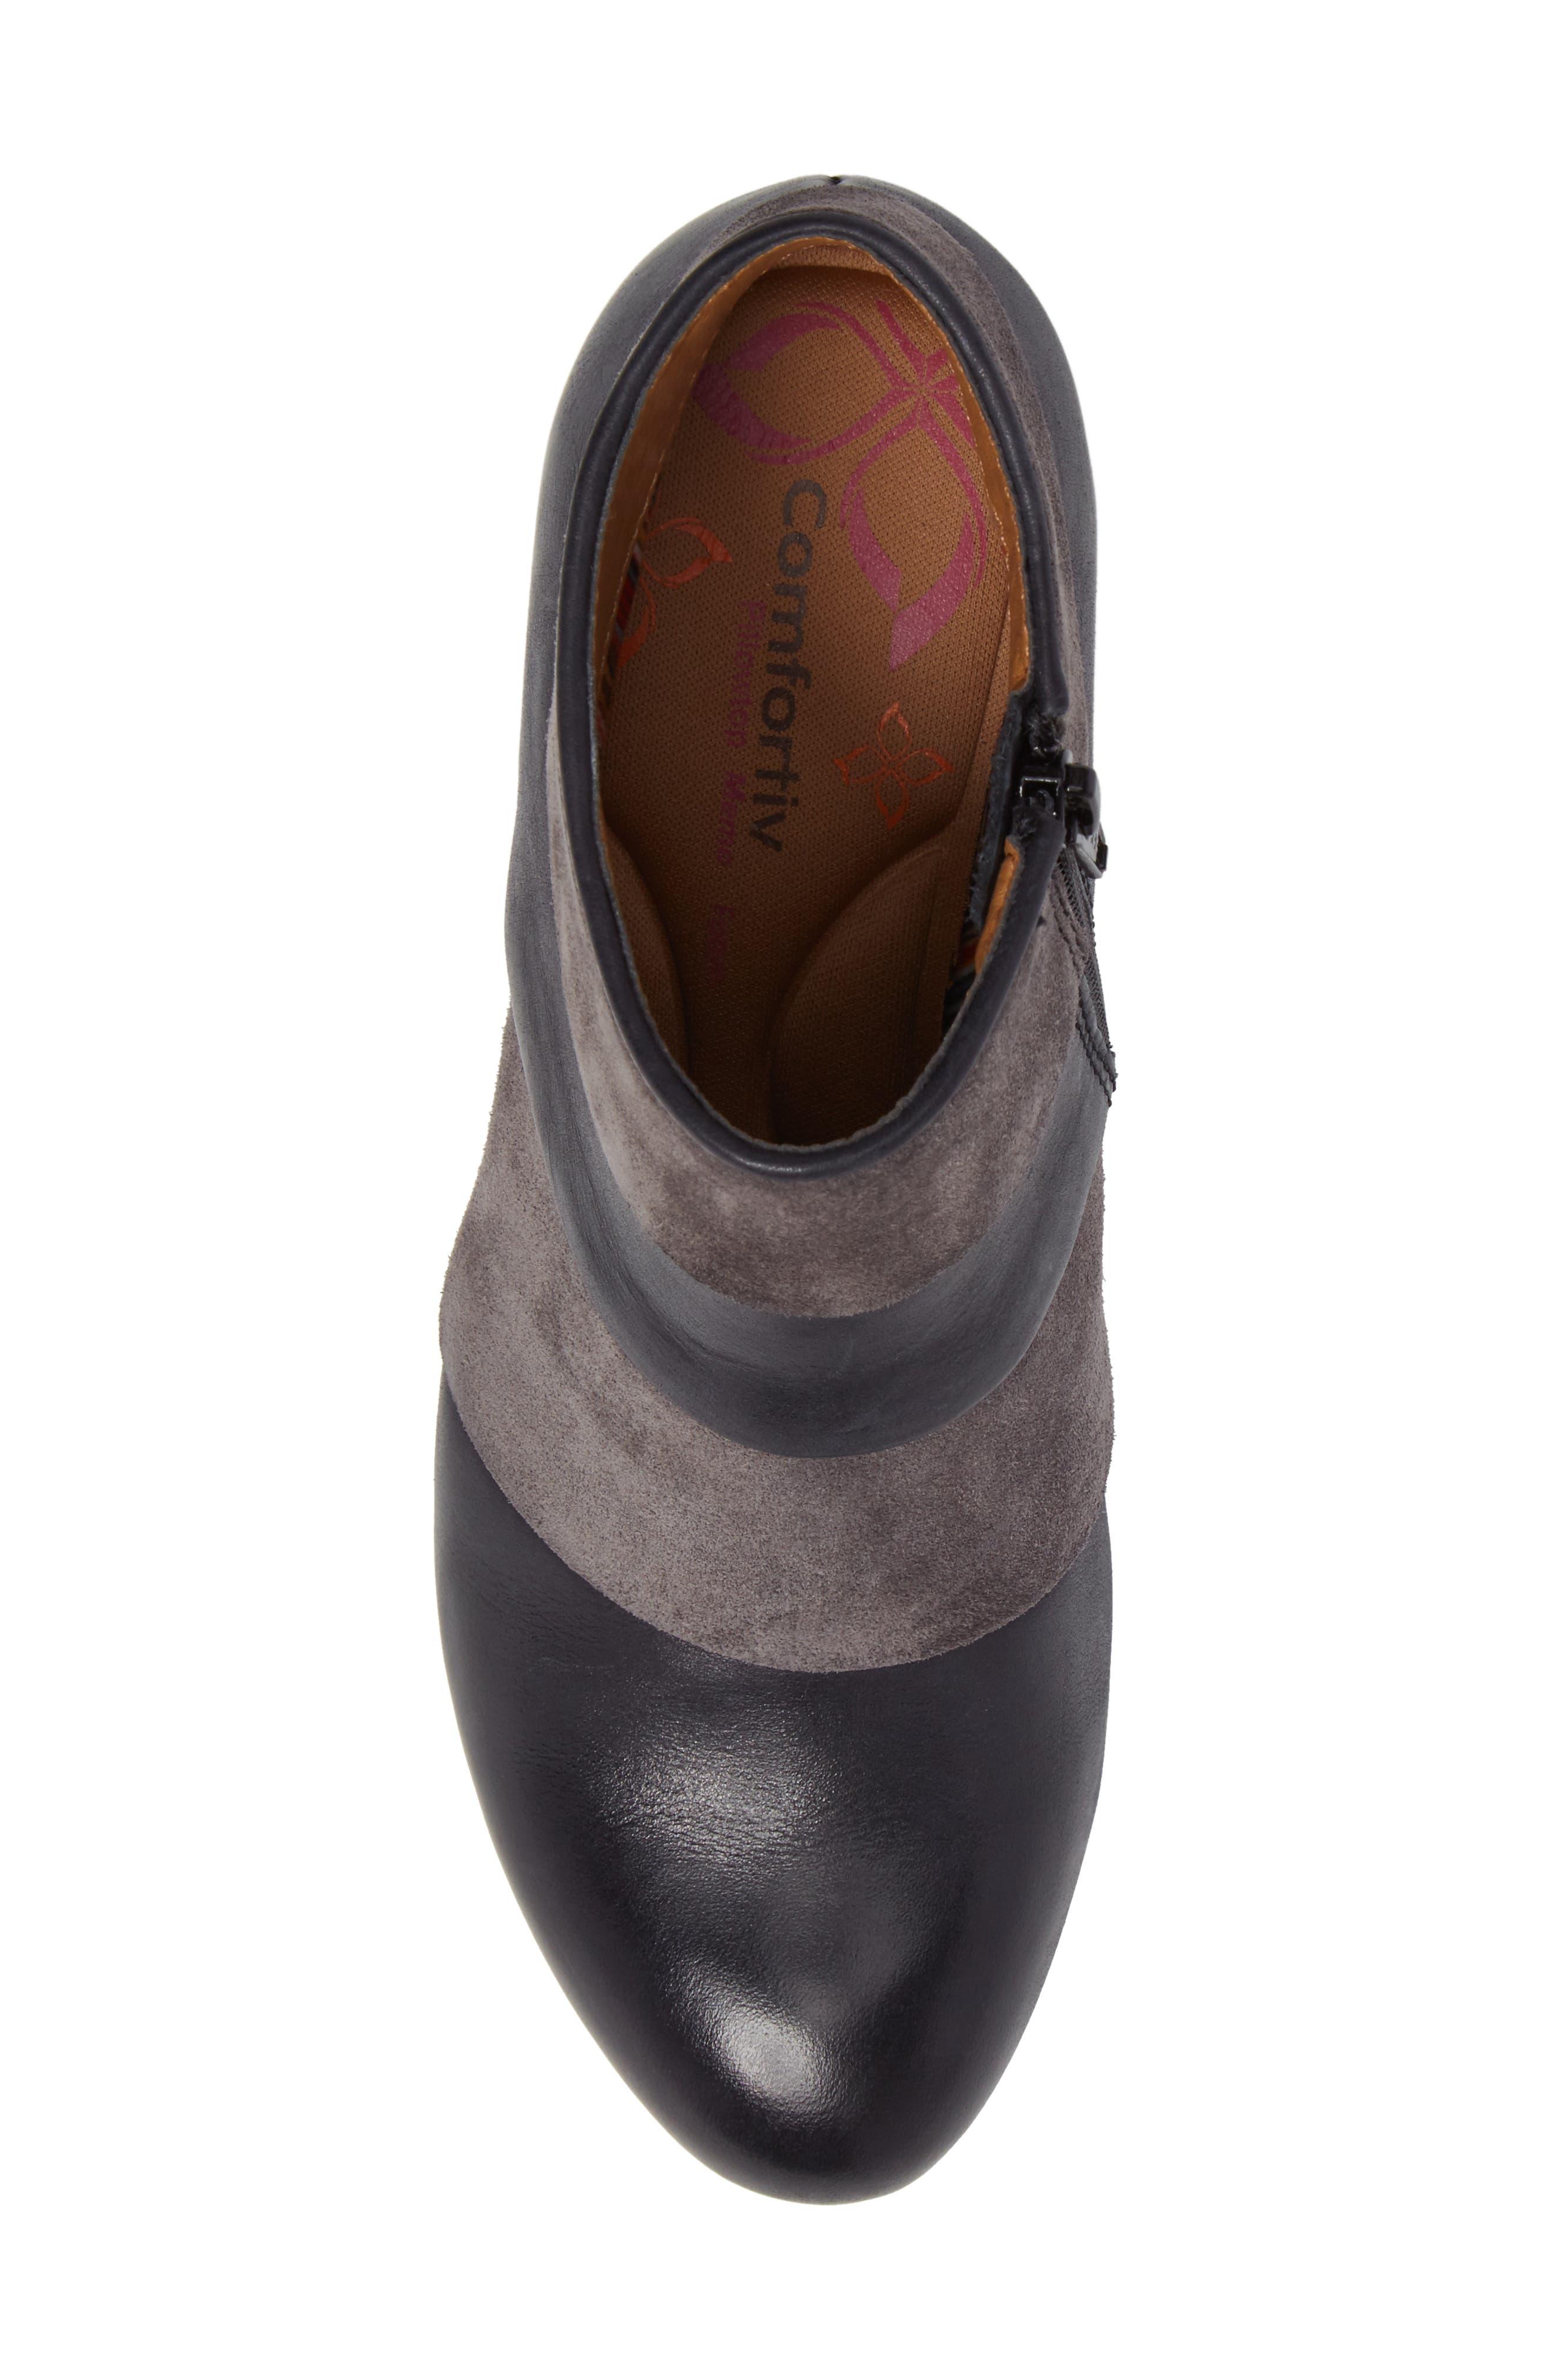 Amesbury Colorblock Bootie,                             Alternate thumbnail 5, color,                             Black/ Steel Grey Leather